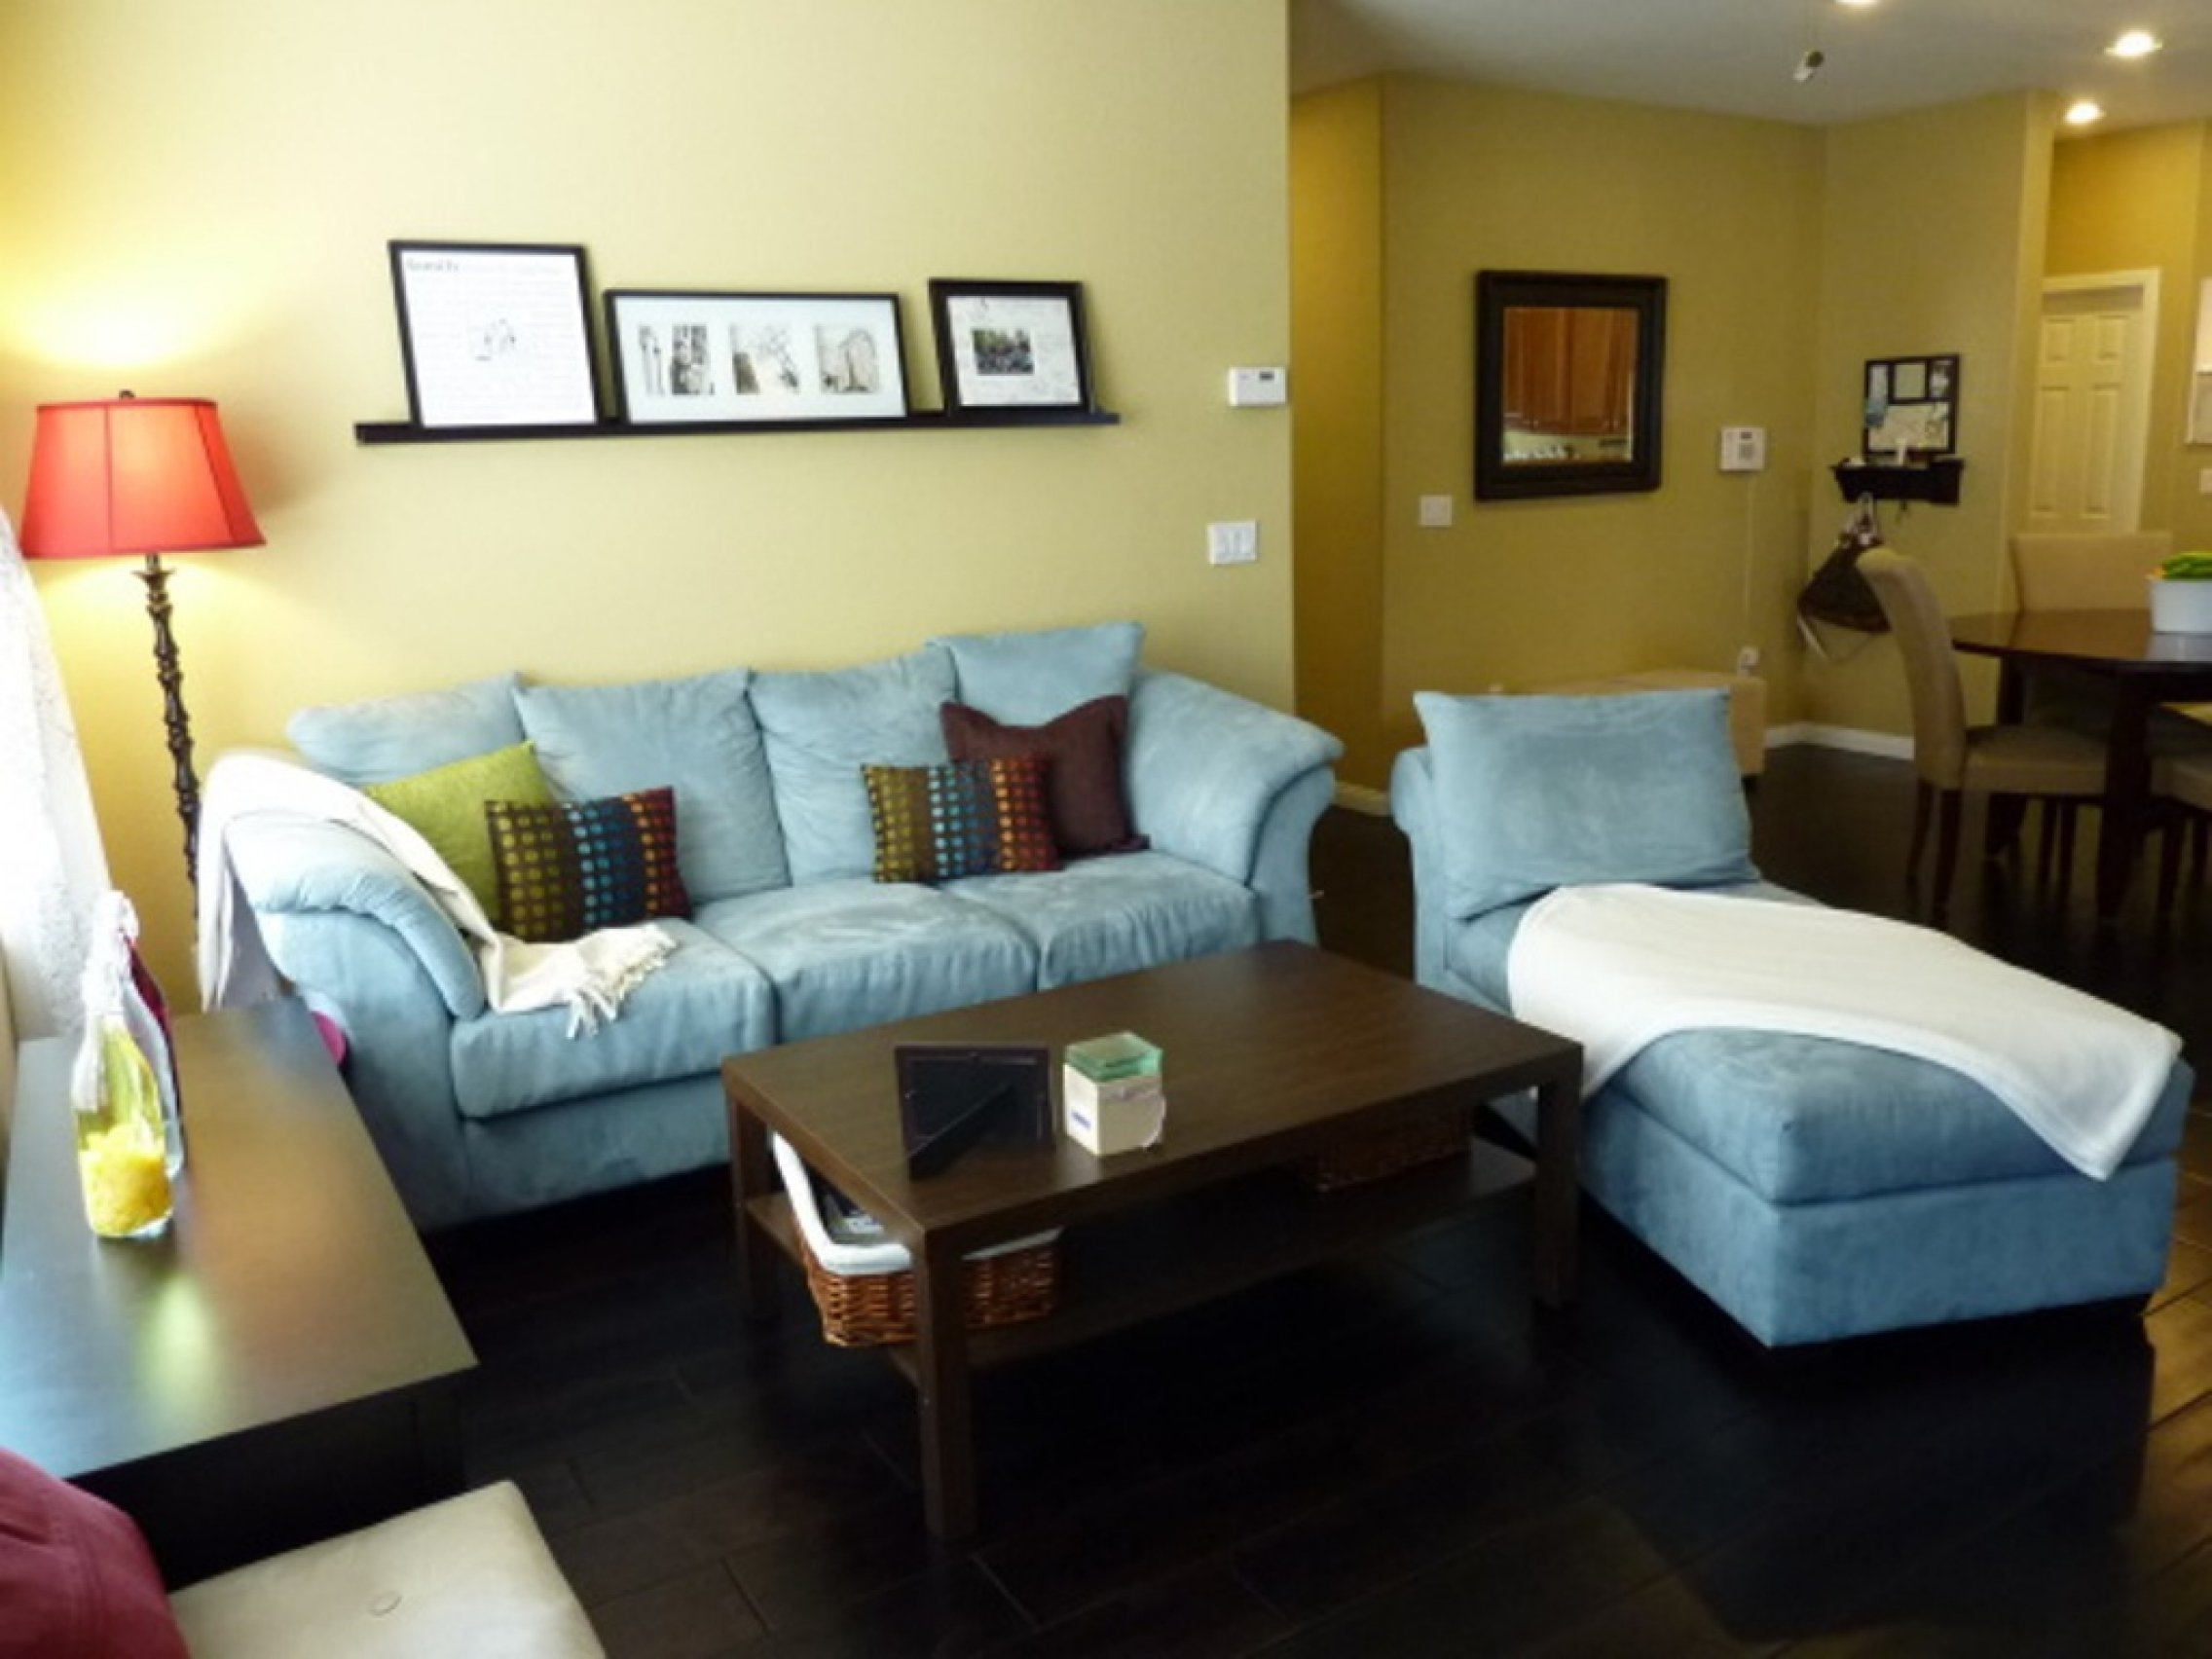 10 Stylish House Decorating Ideas On A Budget apartment living room decorating ideas on a budget new decoration 2021